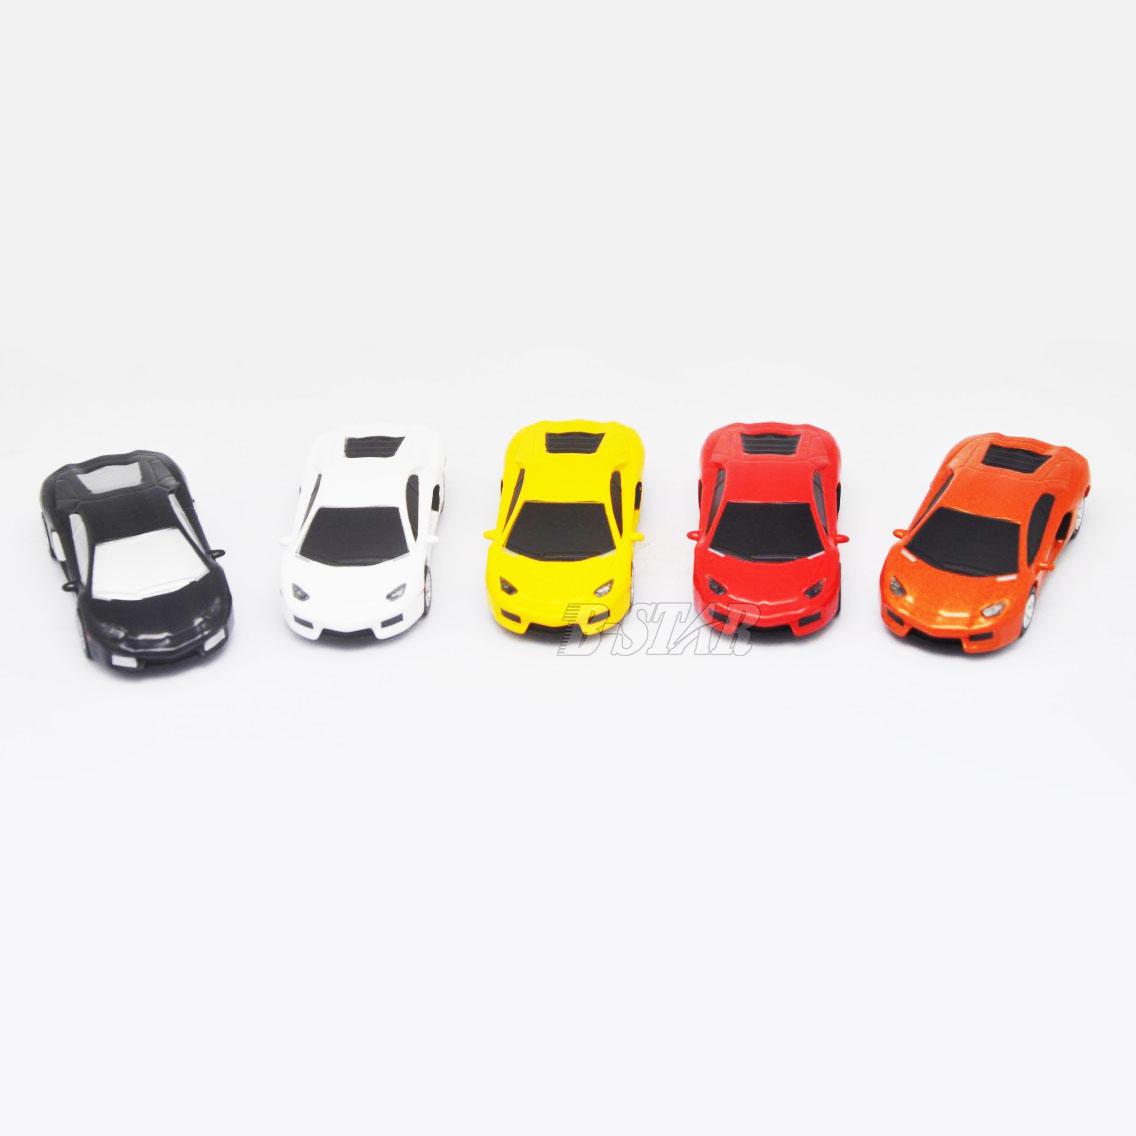 Free shipping Hot-selling Wholesale Cartoon mini small 5 Colours car 2-32GB USB 2.0 Flash Memory Stick Pen Drive U Disk RU425(China (Mainland))